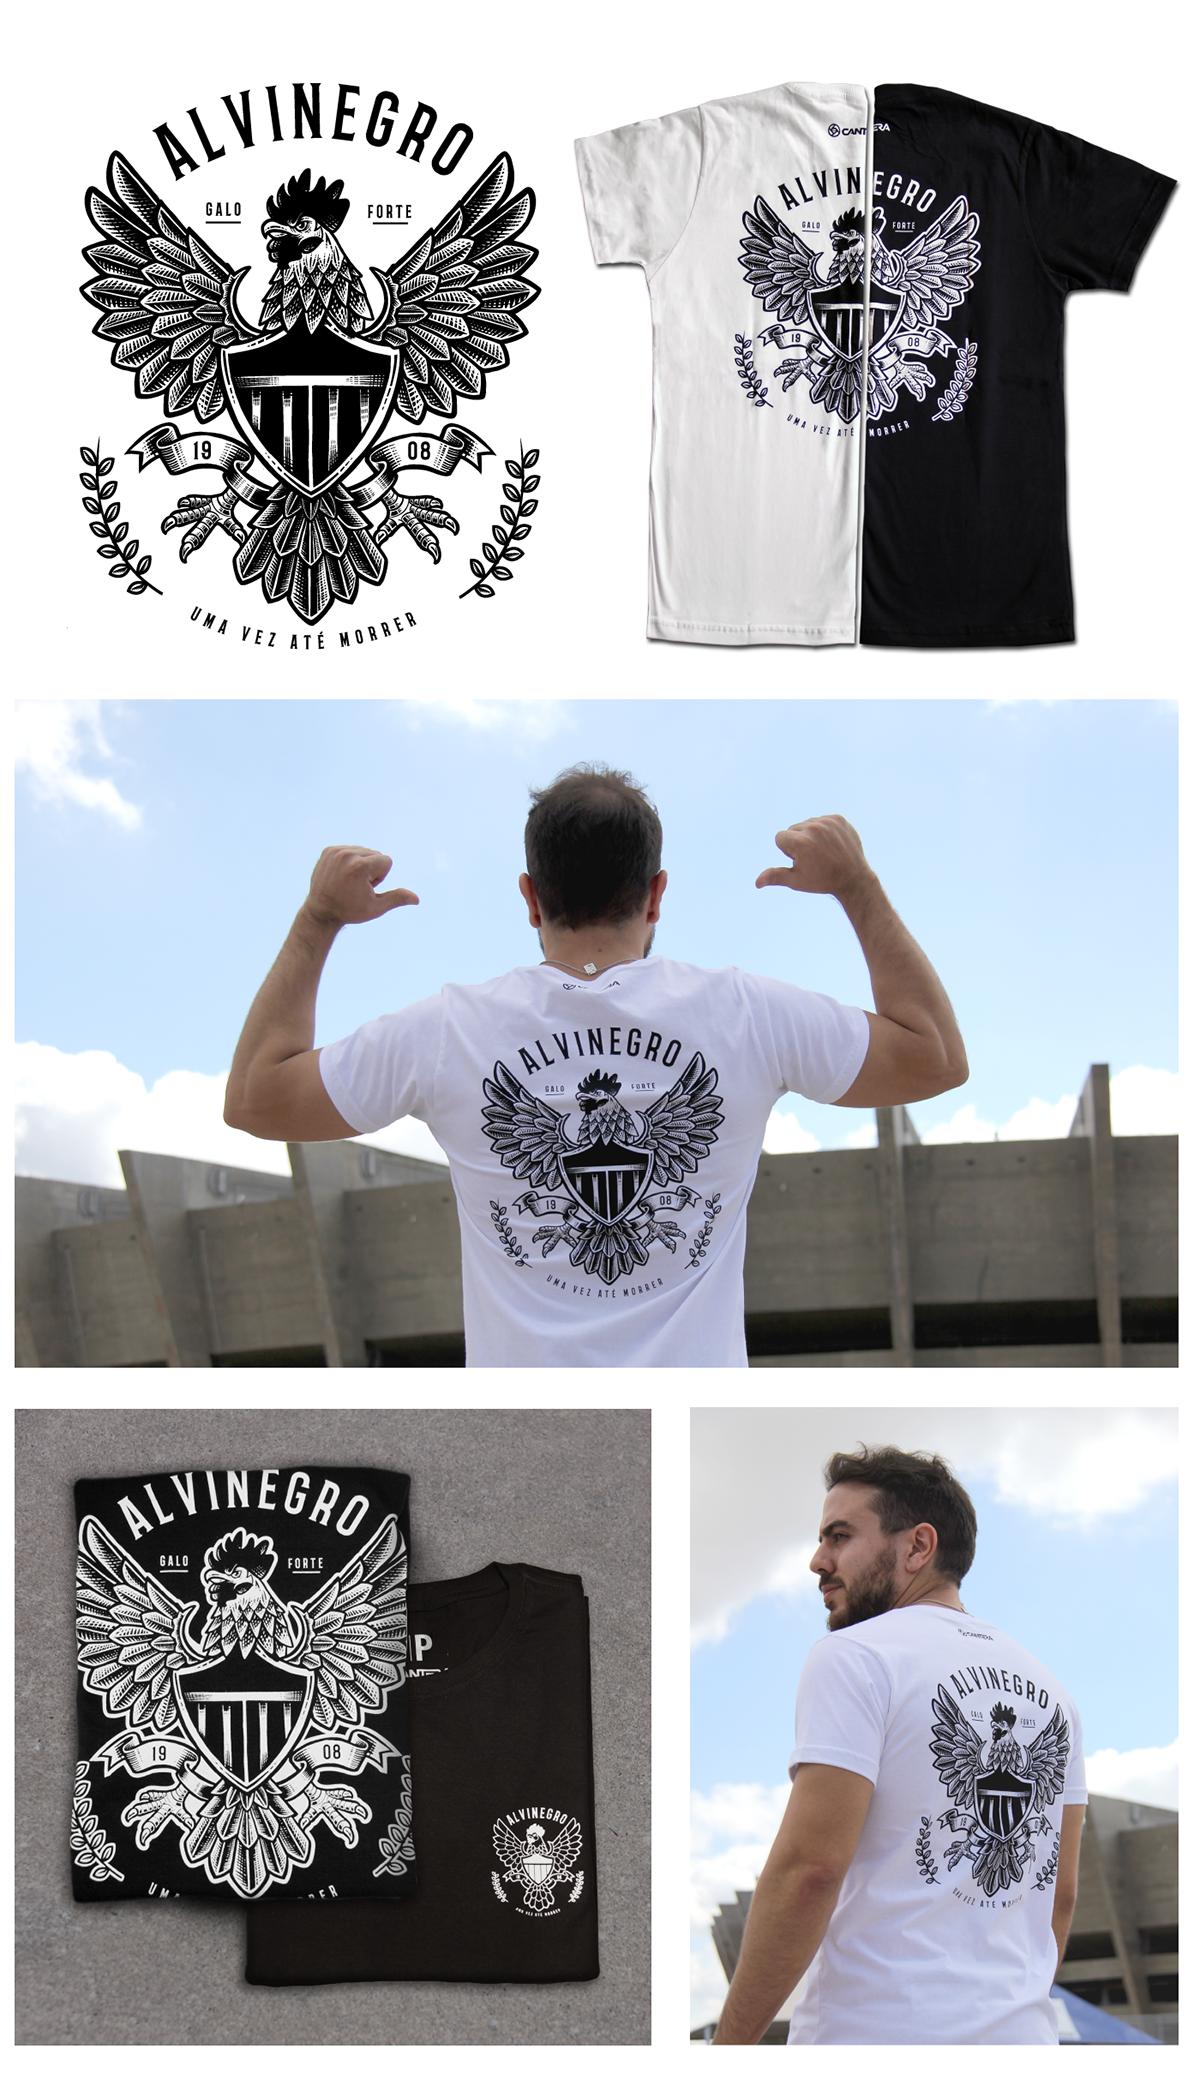 Soccer Team T Shirt Design On Wacom Gallery